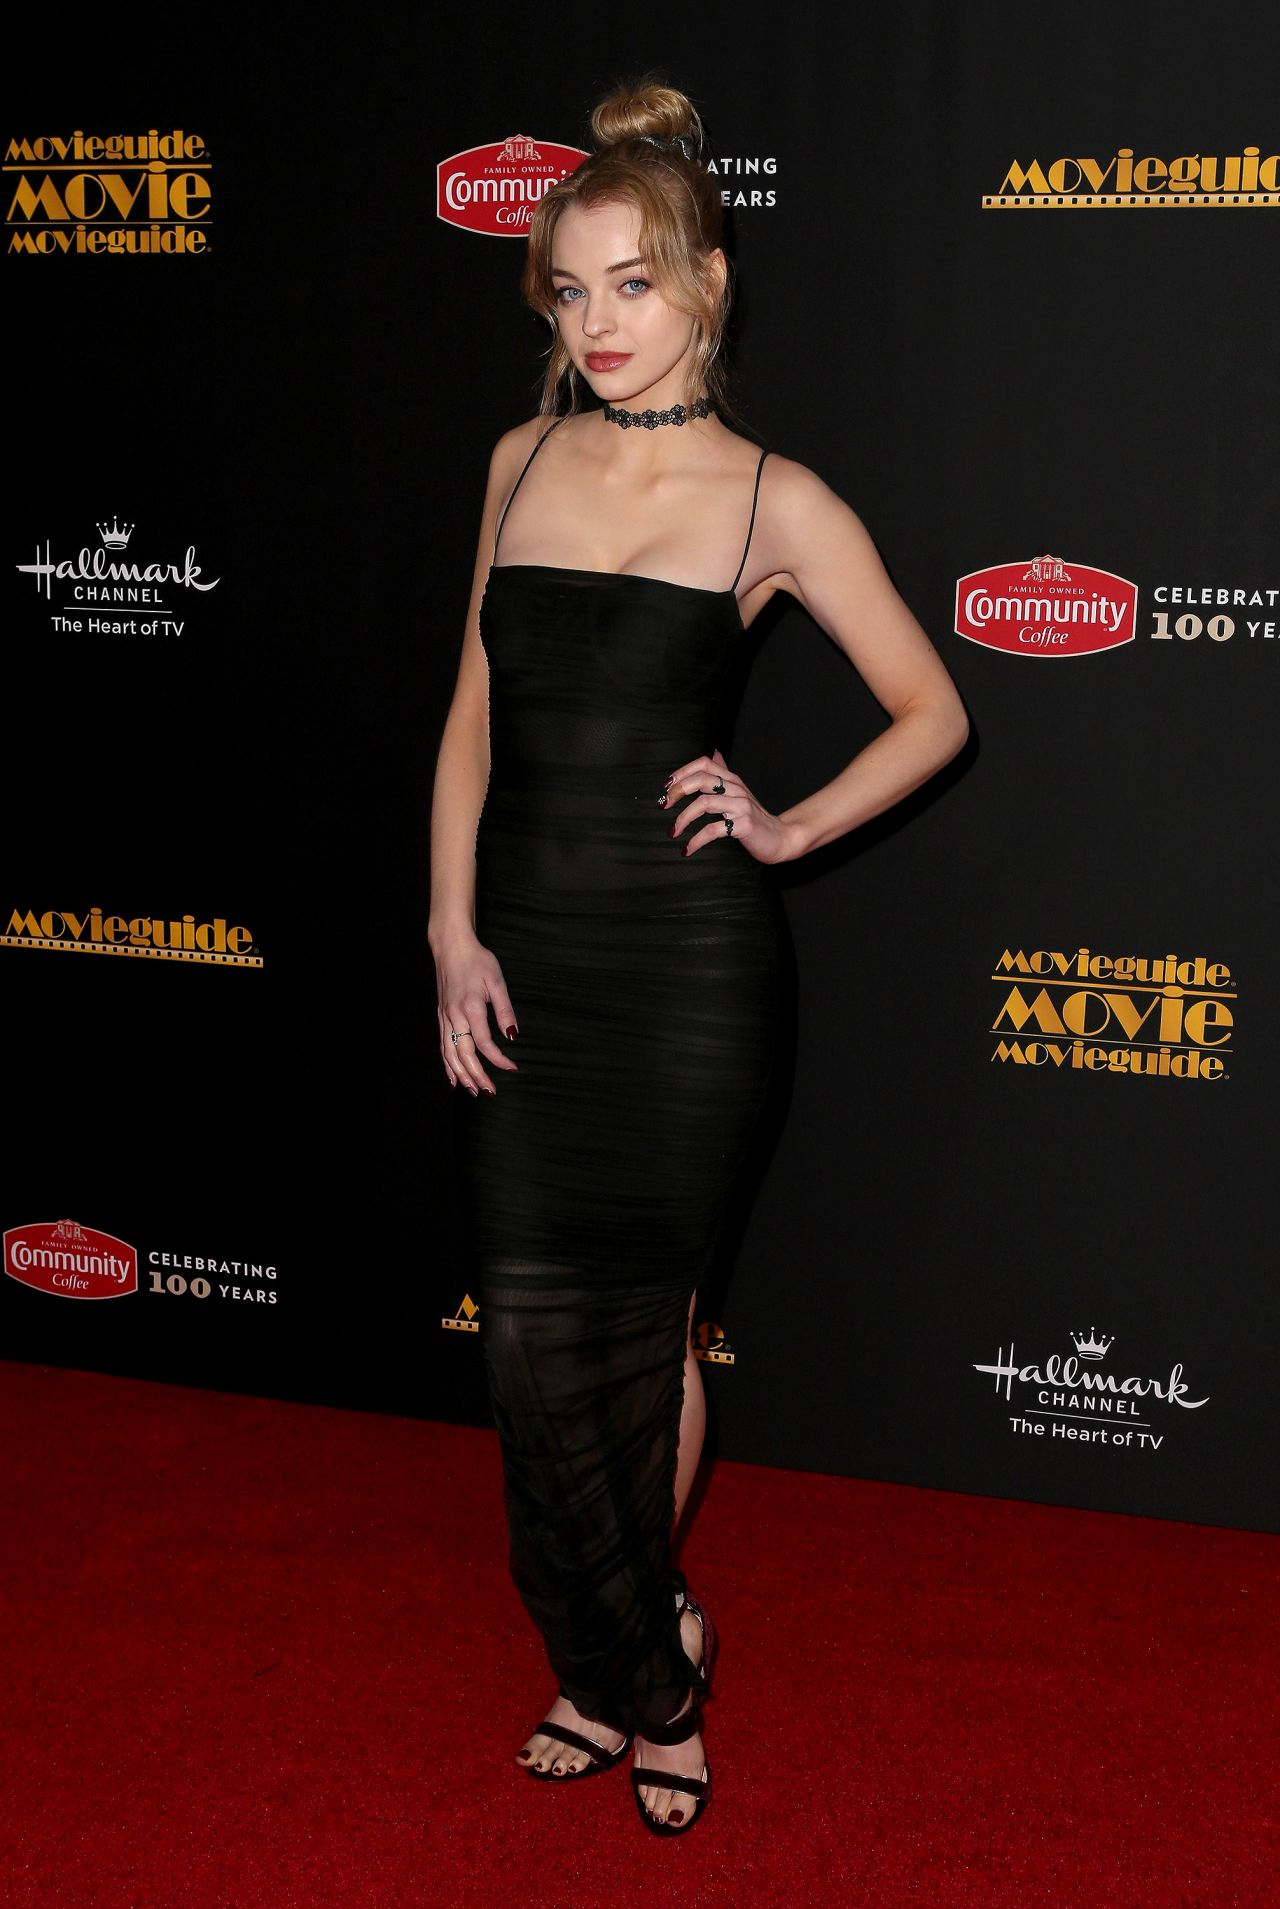 2019 Olivia Rose nude photos 2019